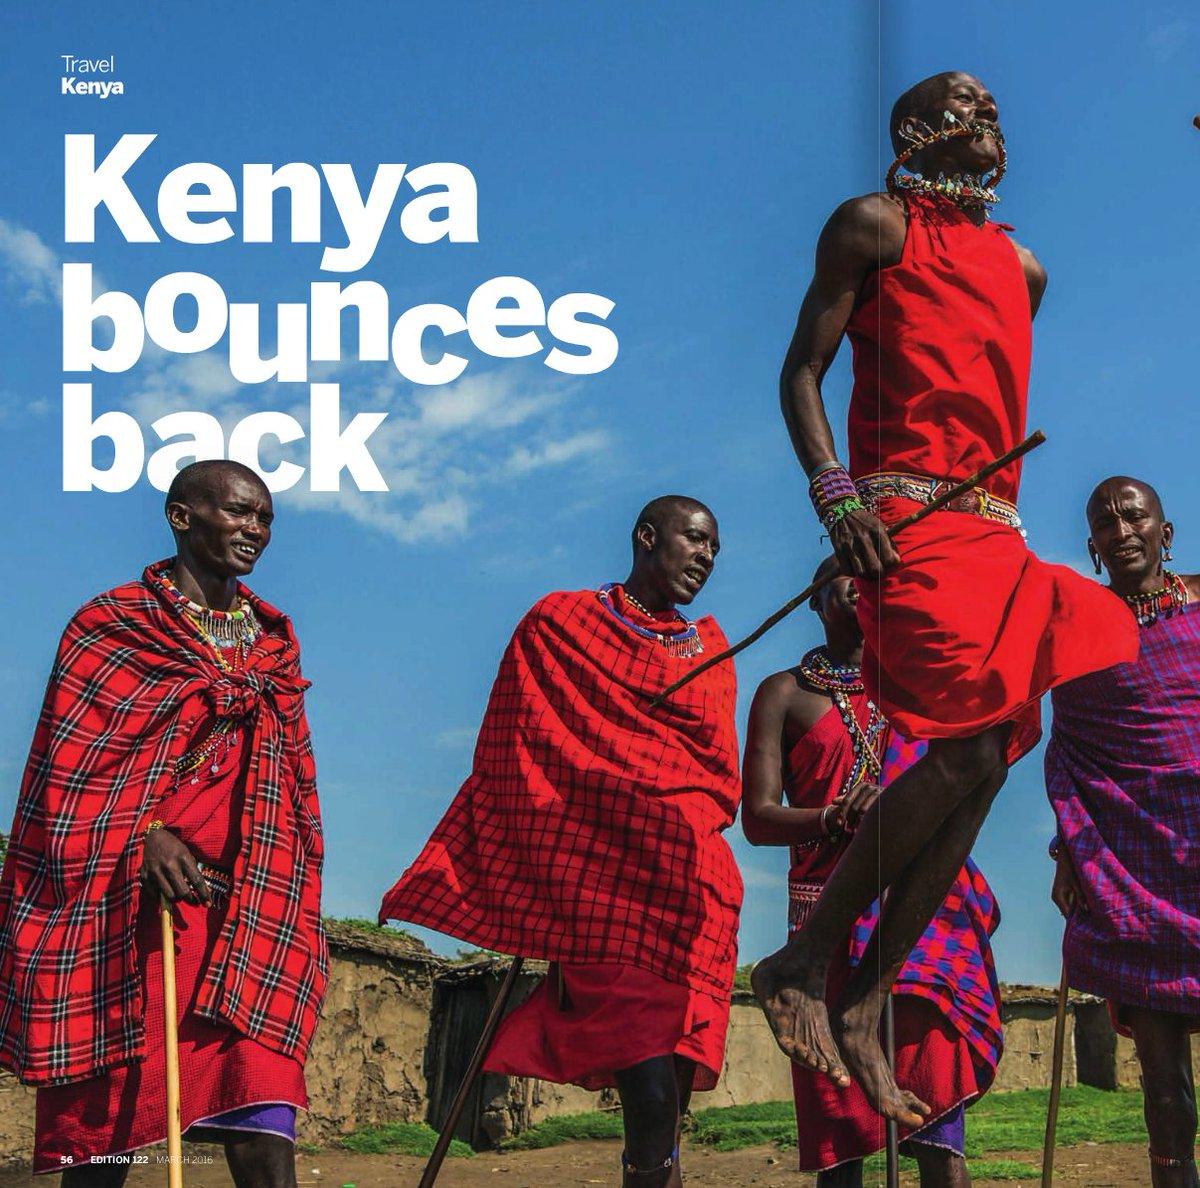 See my piece on resurgent tourism in @KenyaAirways mag Msafiri https://t.co/Xme0pjGDiB #WhyILoveKenya @jacintanzioka https://t.co/UdrJomtY0N